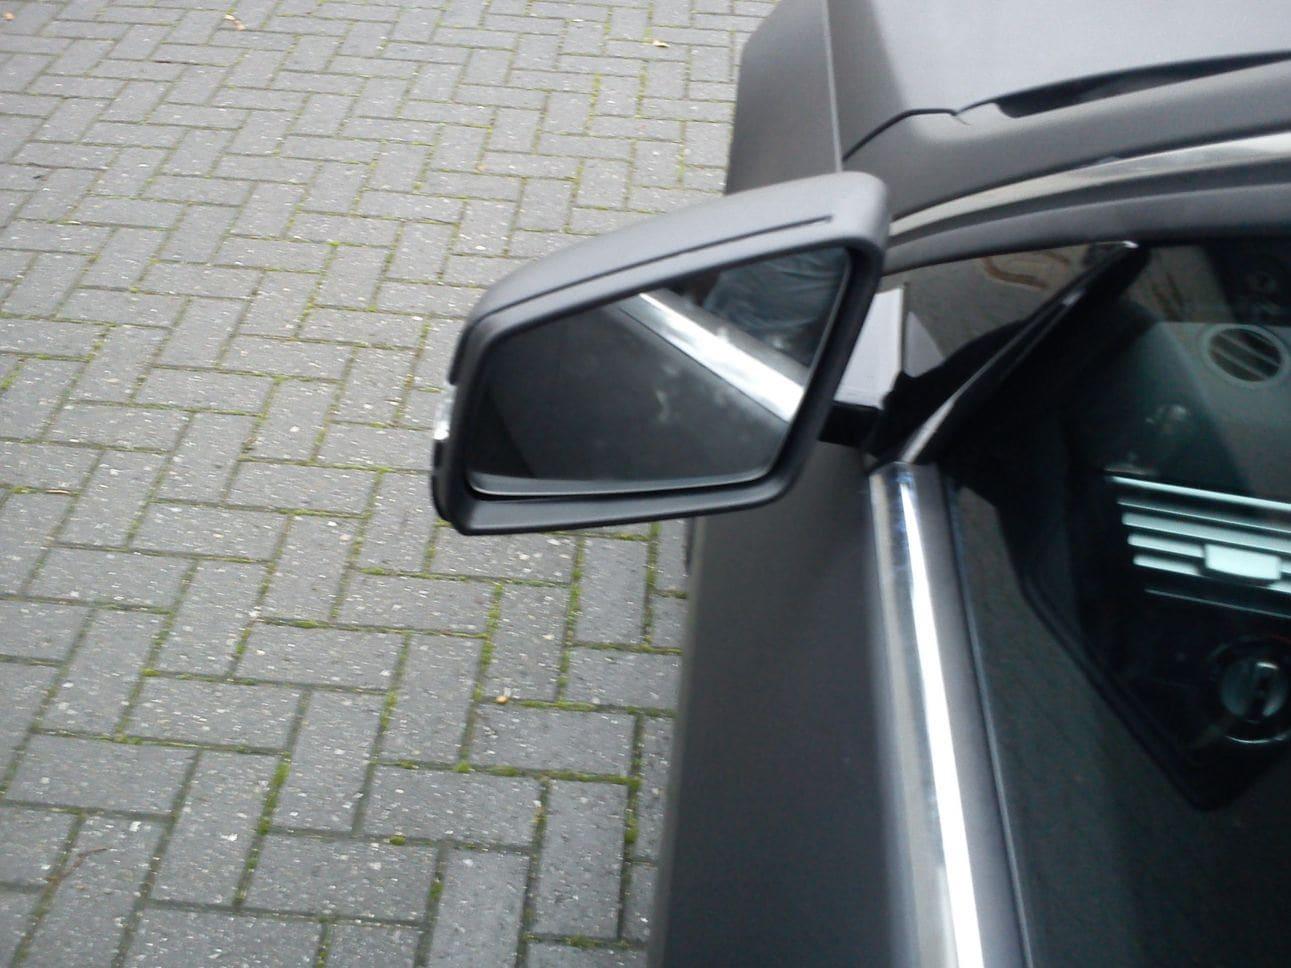 Mercedes E320 met Mat Zwarte Wrap, Carwrapping door Wrapmyride.nu Foto-nr:6237, ©2021